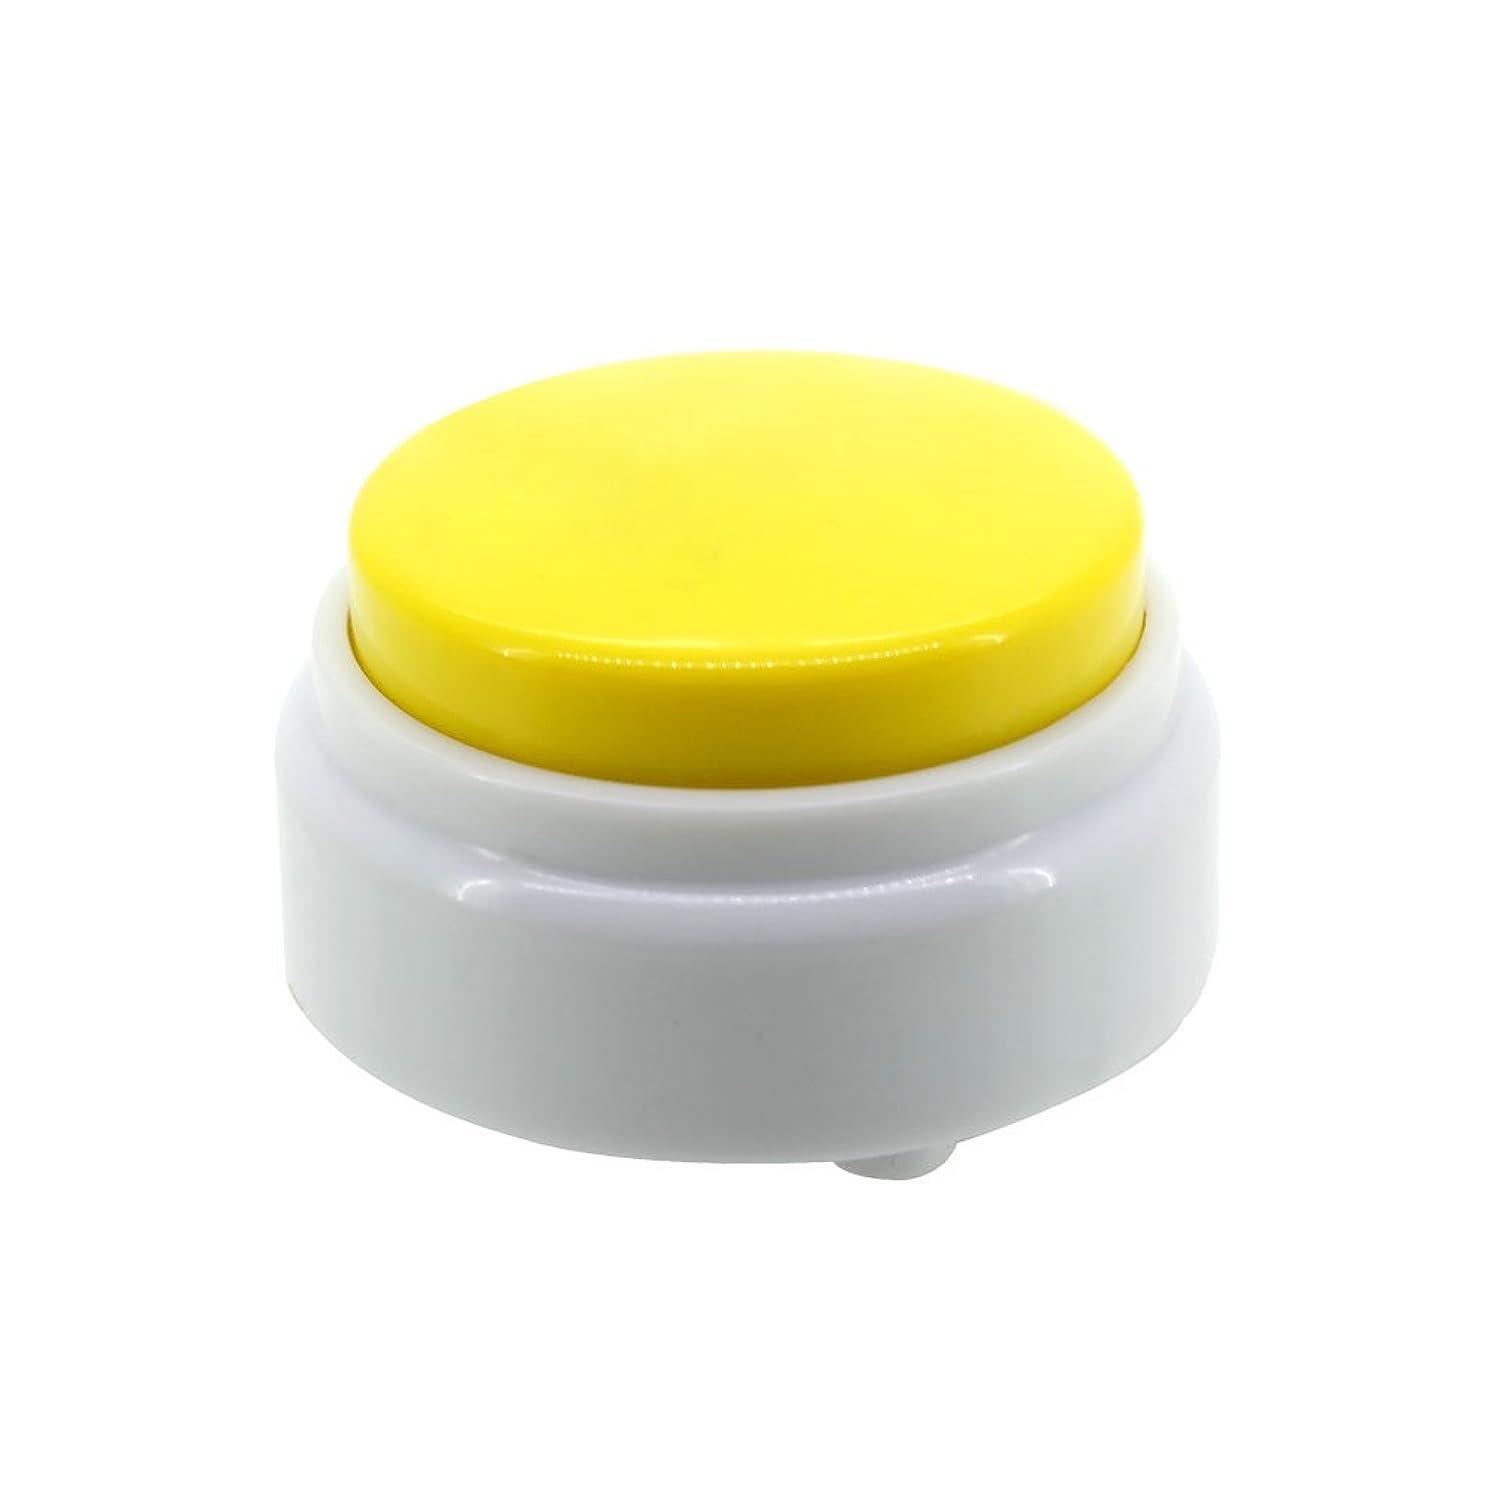 Netural Mini Size Sound Button-20S Record Talking Button-High Sound Quality Answer Buzzer-Recording Press Button(Yellow+White)